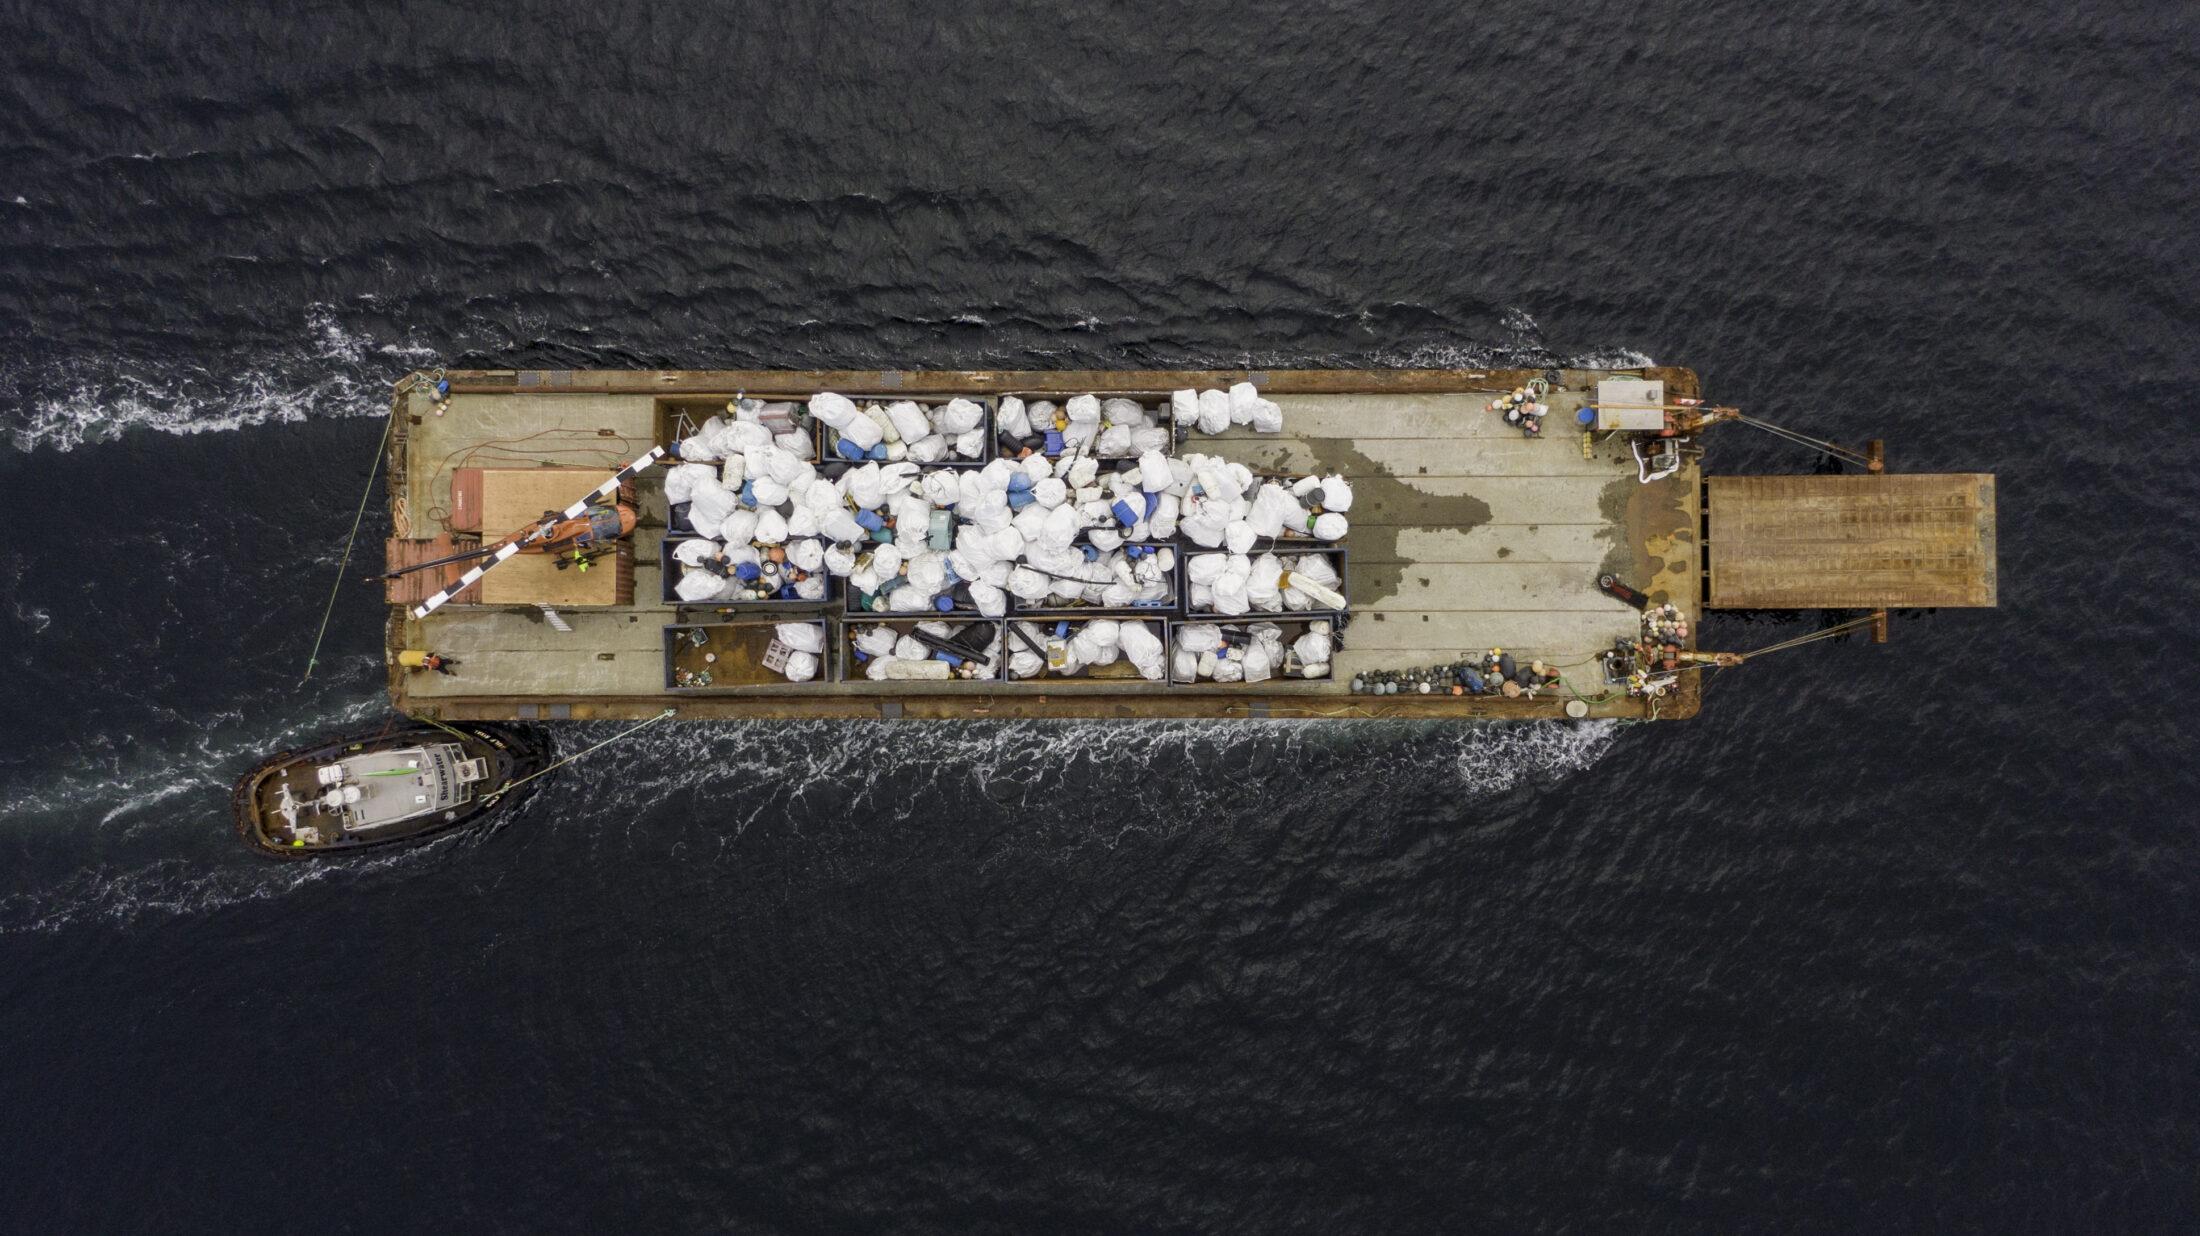 Barge moving debris, Clean Coast, Clean Waters Initiative